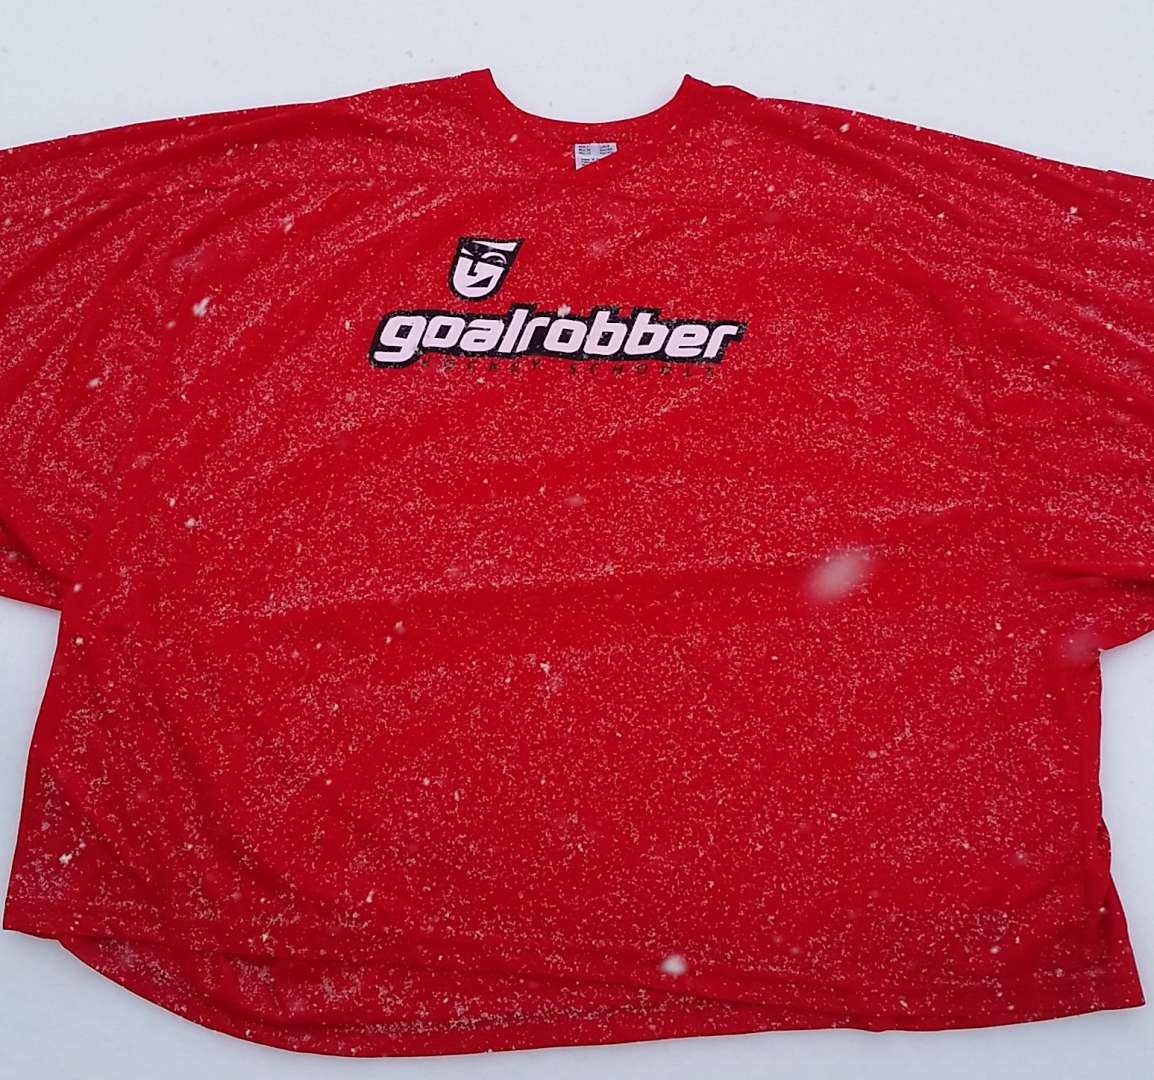 2a9a5697 Practice Jersey - Goalrobber Hockey Schools